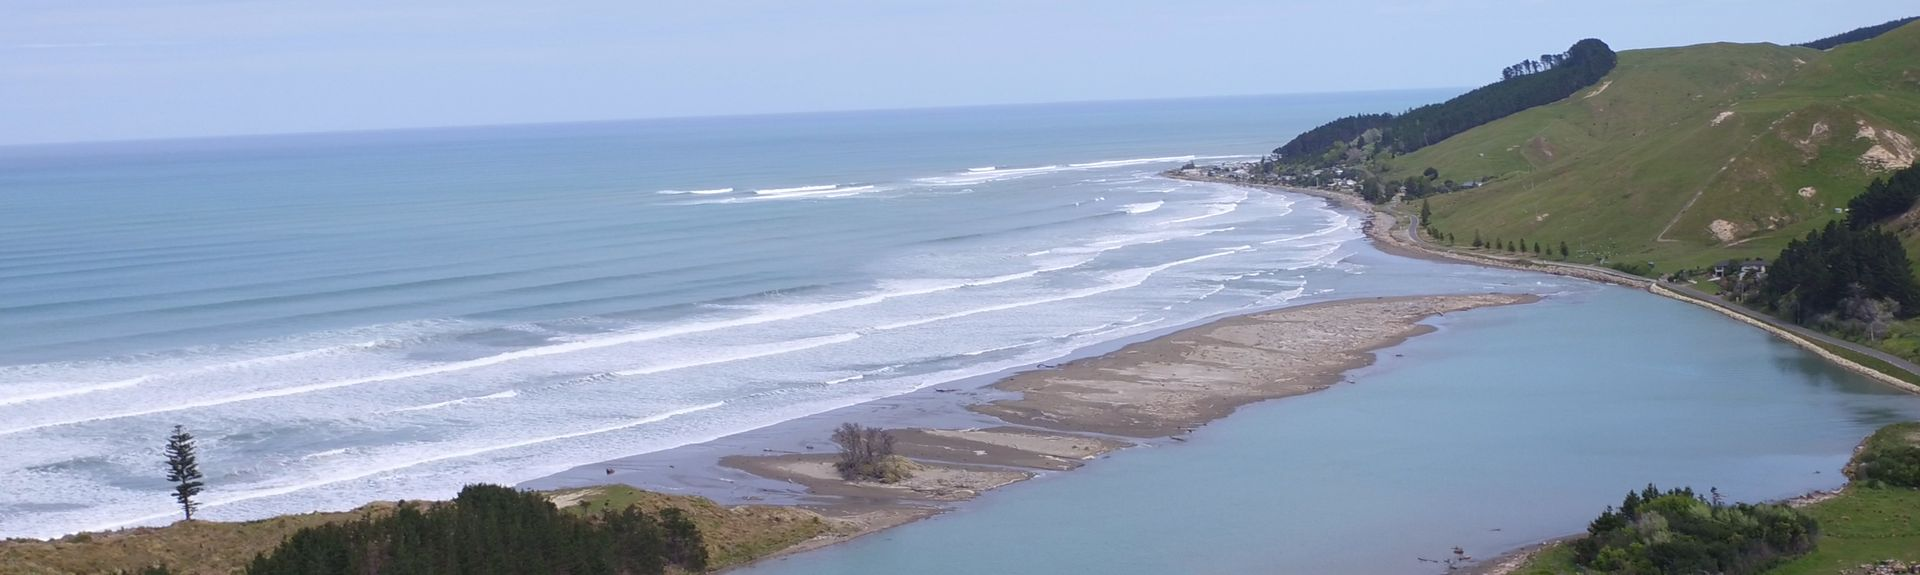 Wairarapa, North Island, New Zealand